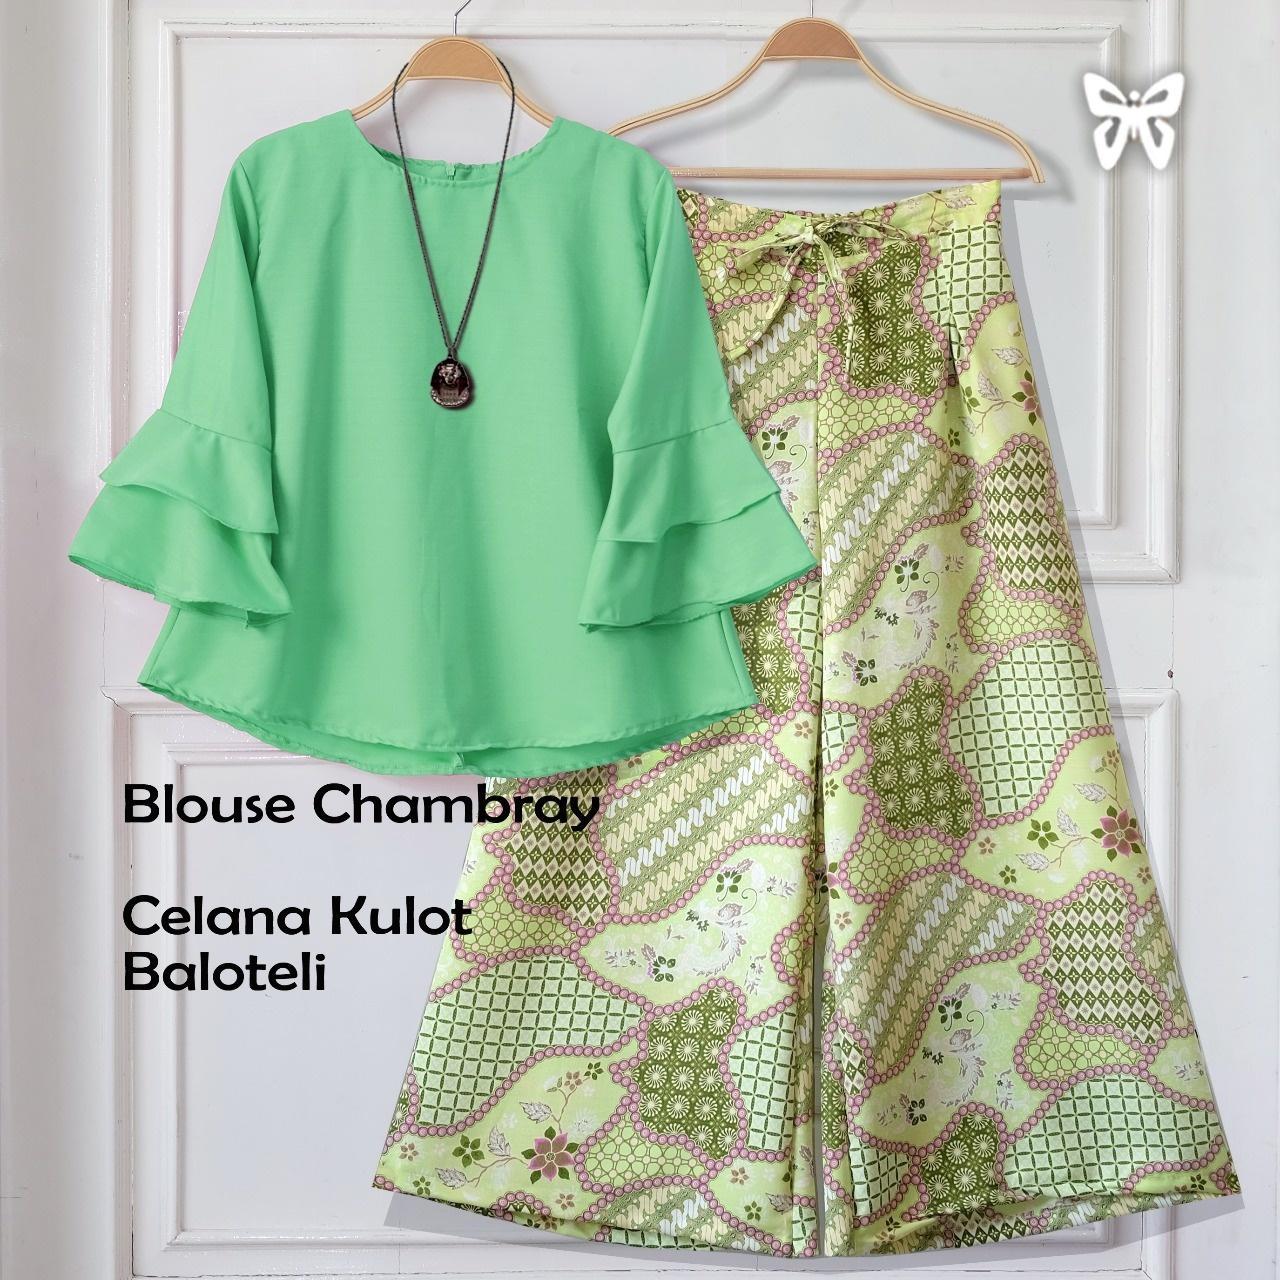 Flavia Store Setelan Wanita Batik FS0734 - HIJAU TOSCA / Stelan Muslimah / Atasan Baju Blouse Kemeja Lengan Panjang Terompet Bawahan Celana Kulot Muslim / Srshania